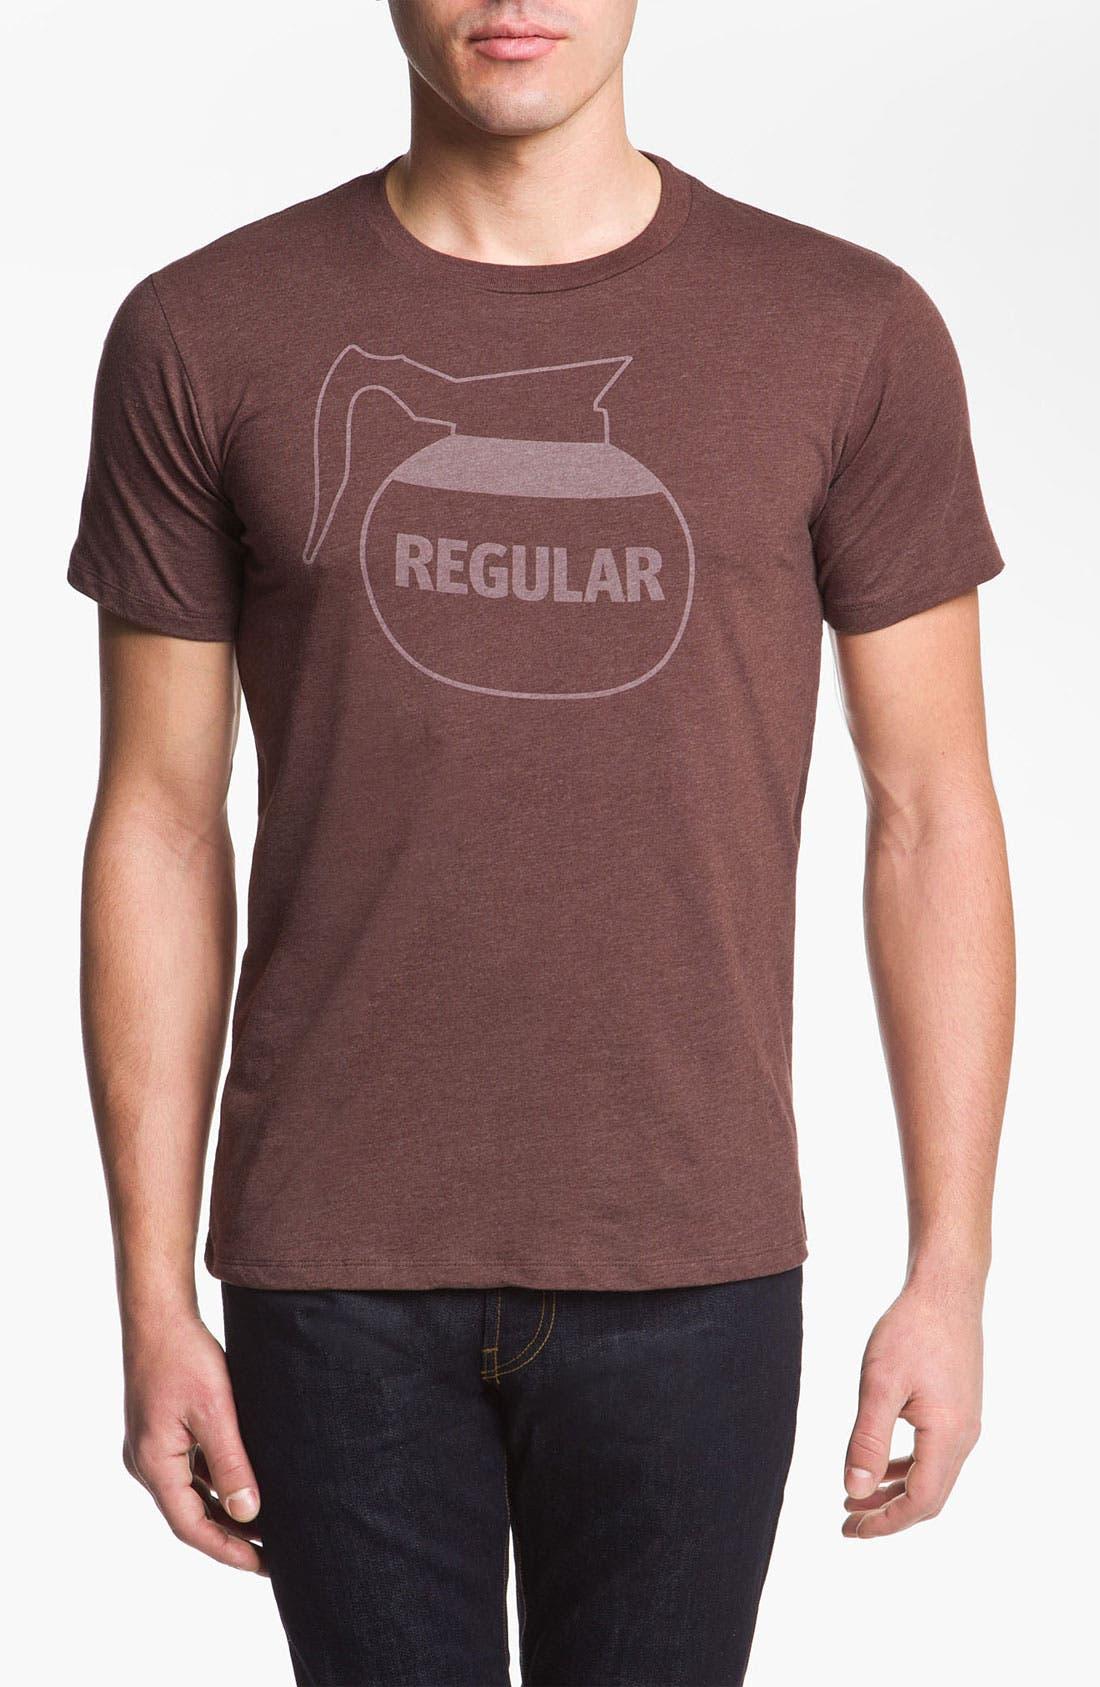 Alternate Image 1 Selected - Headline Shirts 'Regular' T-Shirt